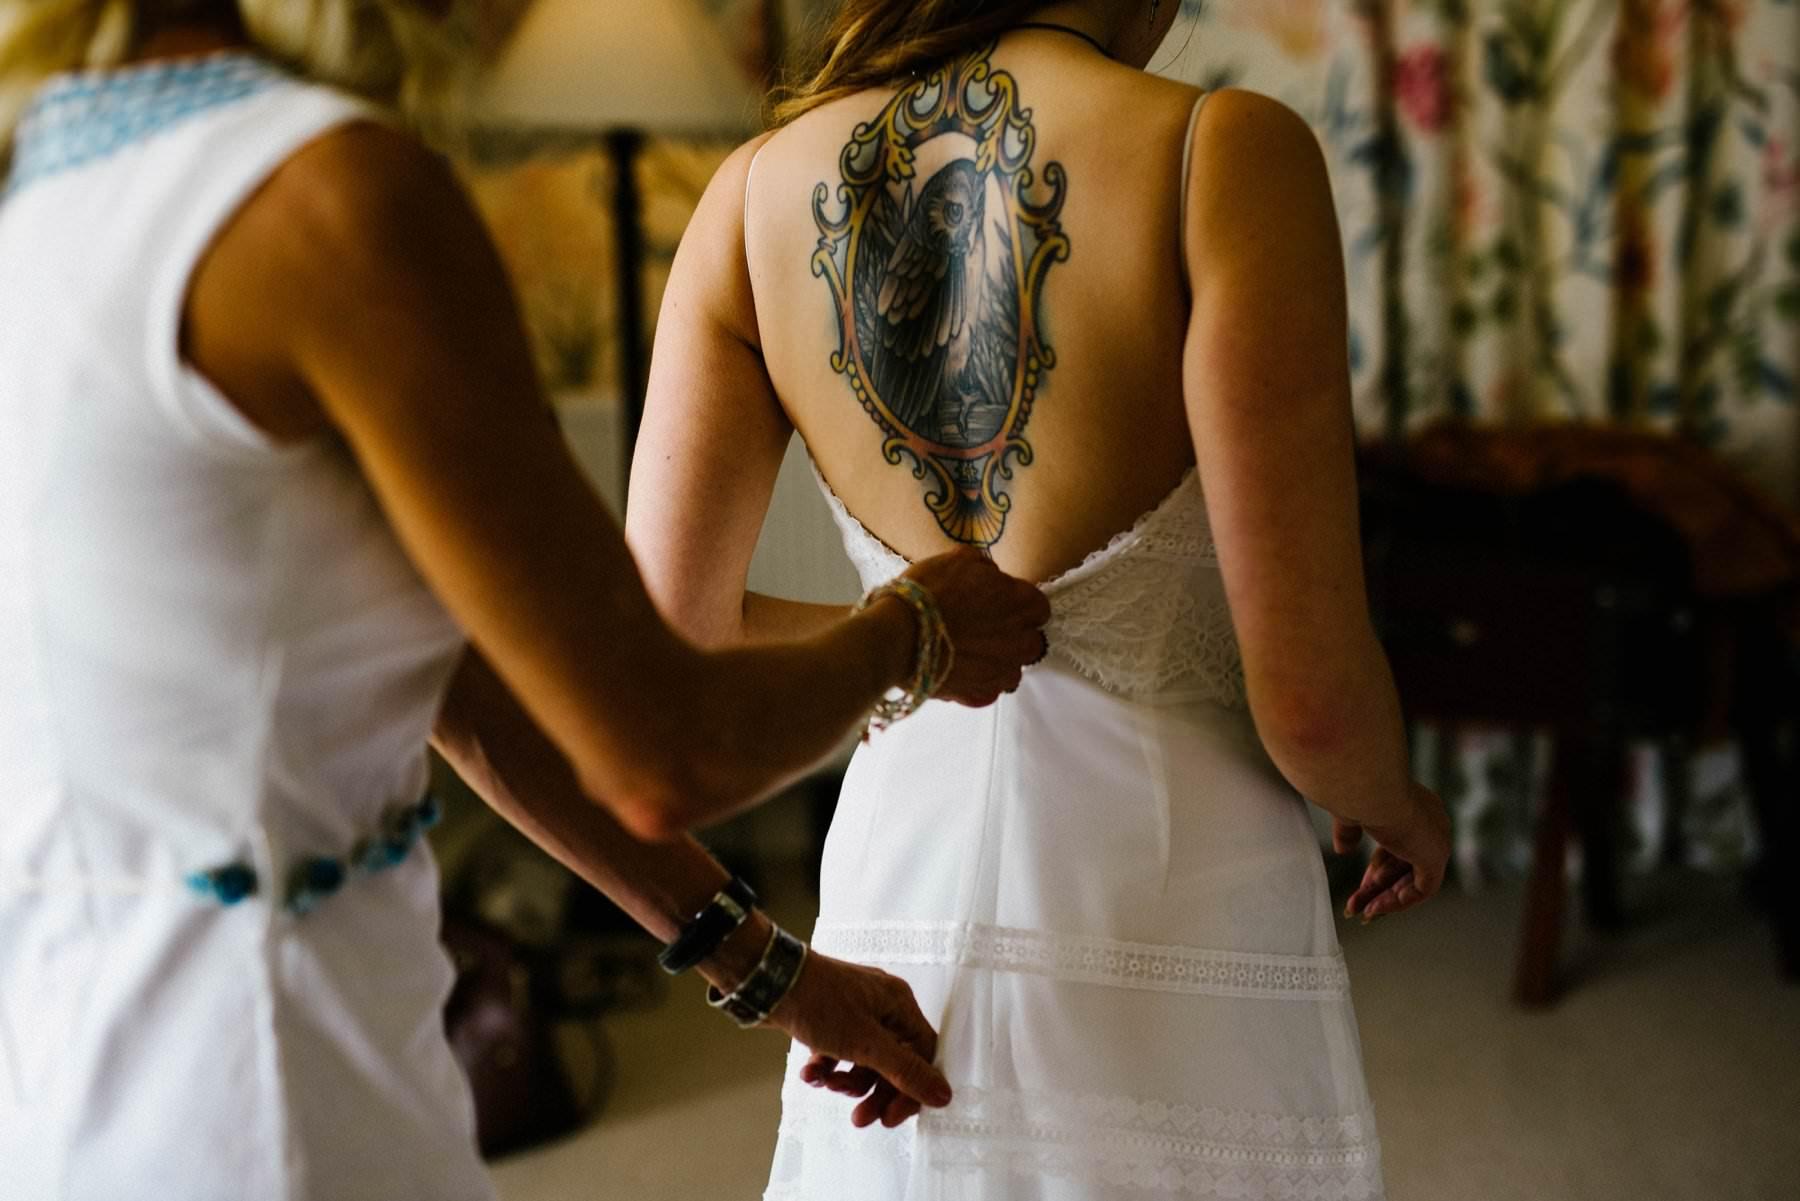 tattoo bride getting ready for wedding photography ireland